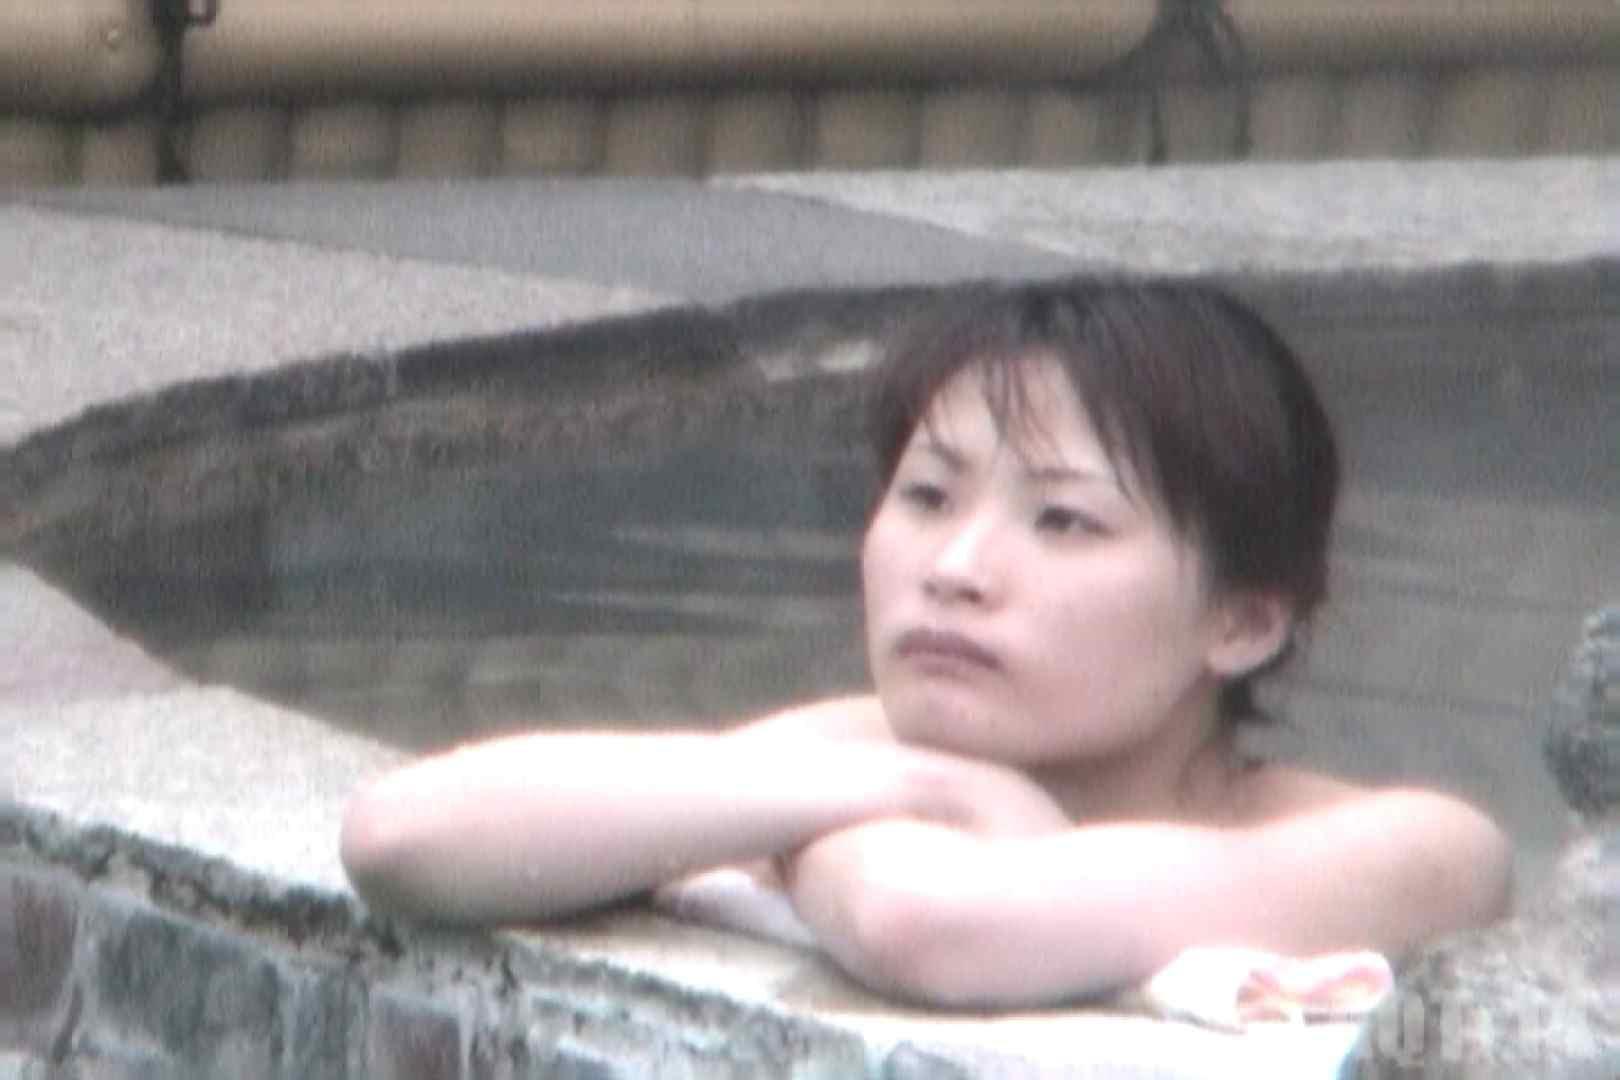 Aquaな露天風呂Vol.822 盗撮大放出 エロ無料画像 98連発 30